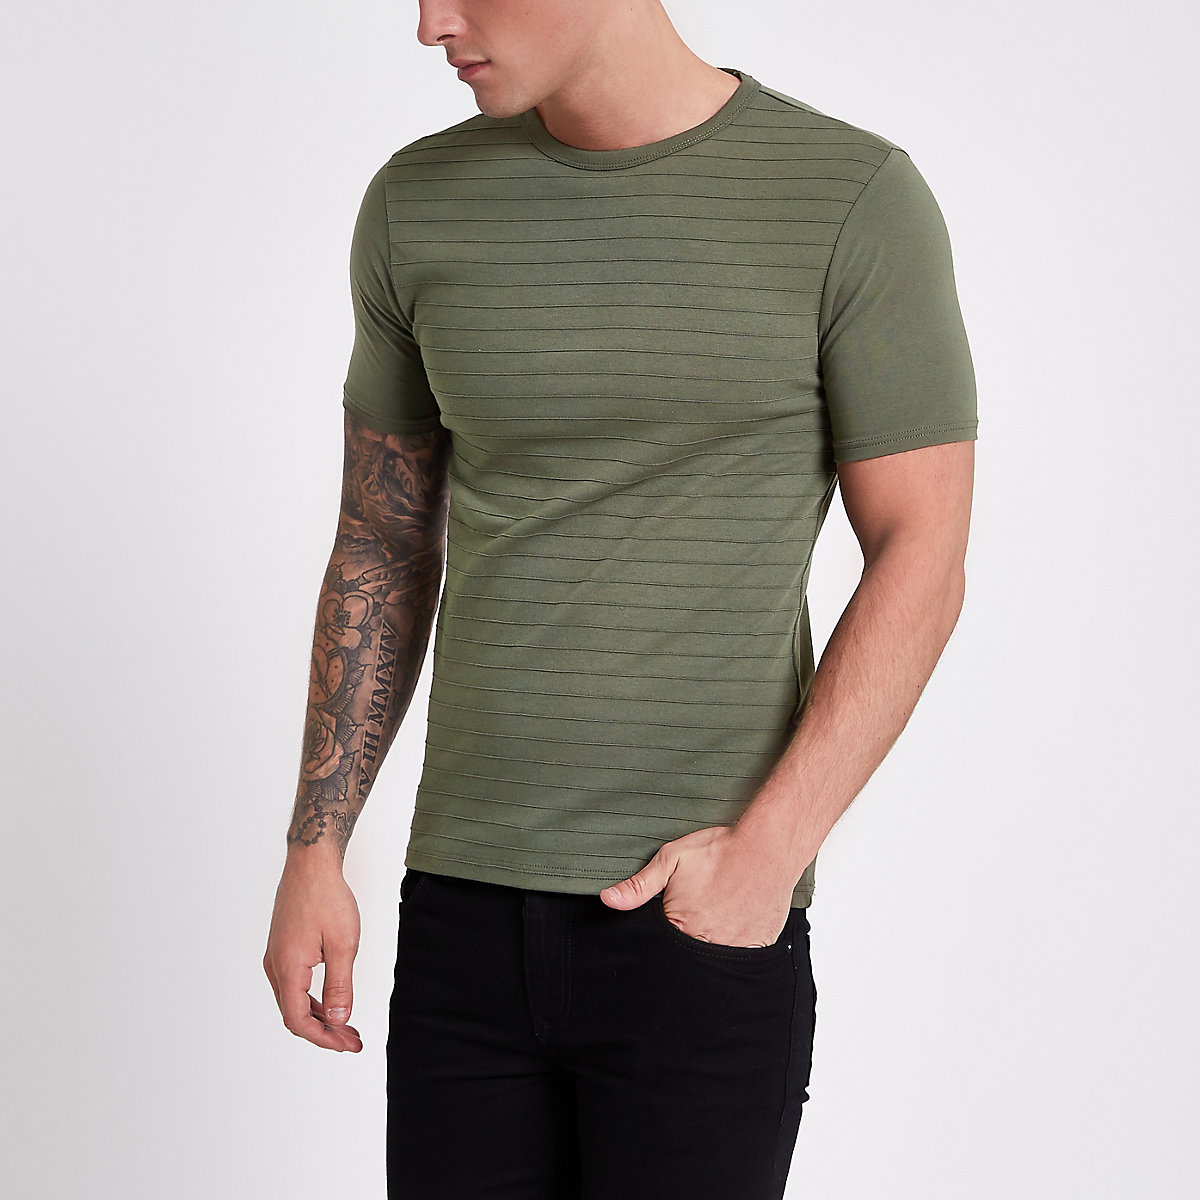 Khaki green short sleeve muscle fit T-shirt